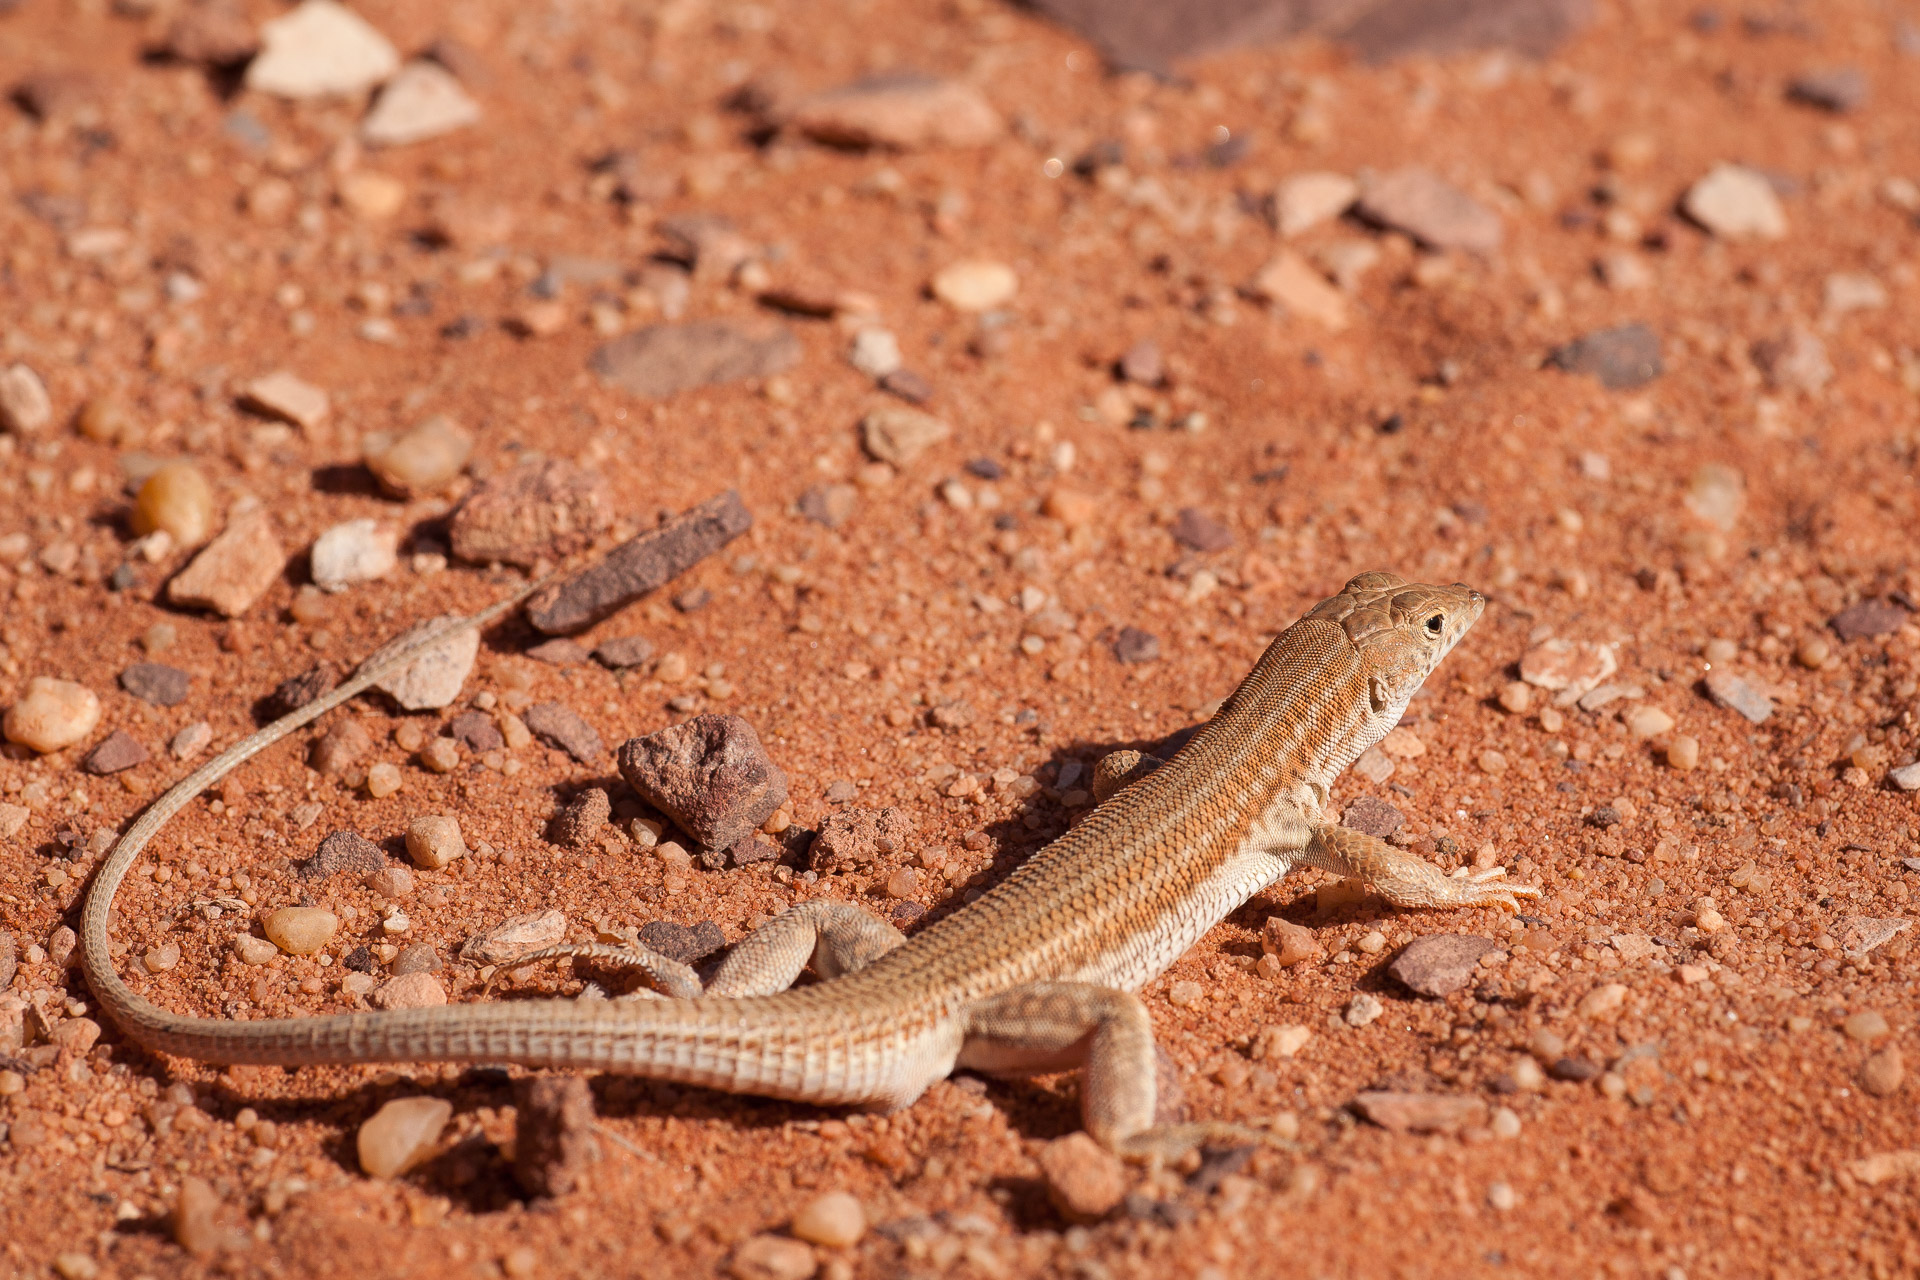 Lézard (Acanthodactylus opheodurus) dans le désert de Wadi Rum en Jordanie